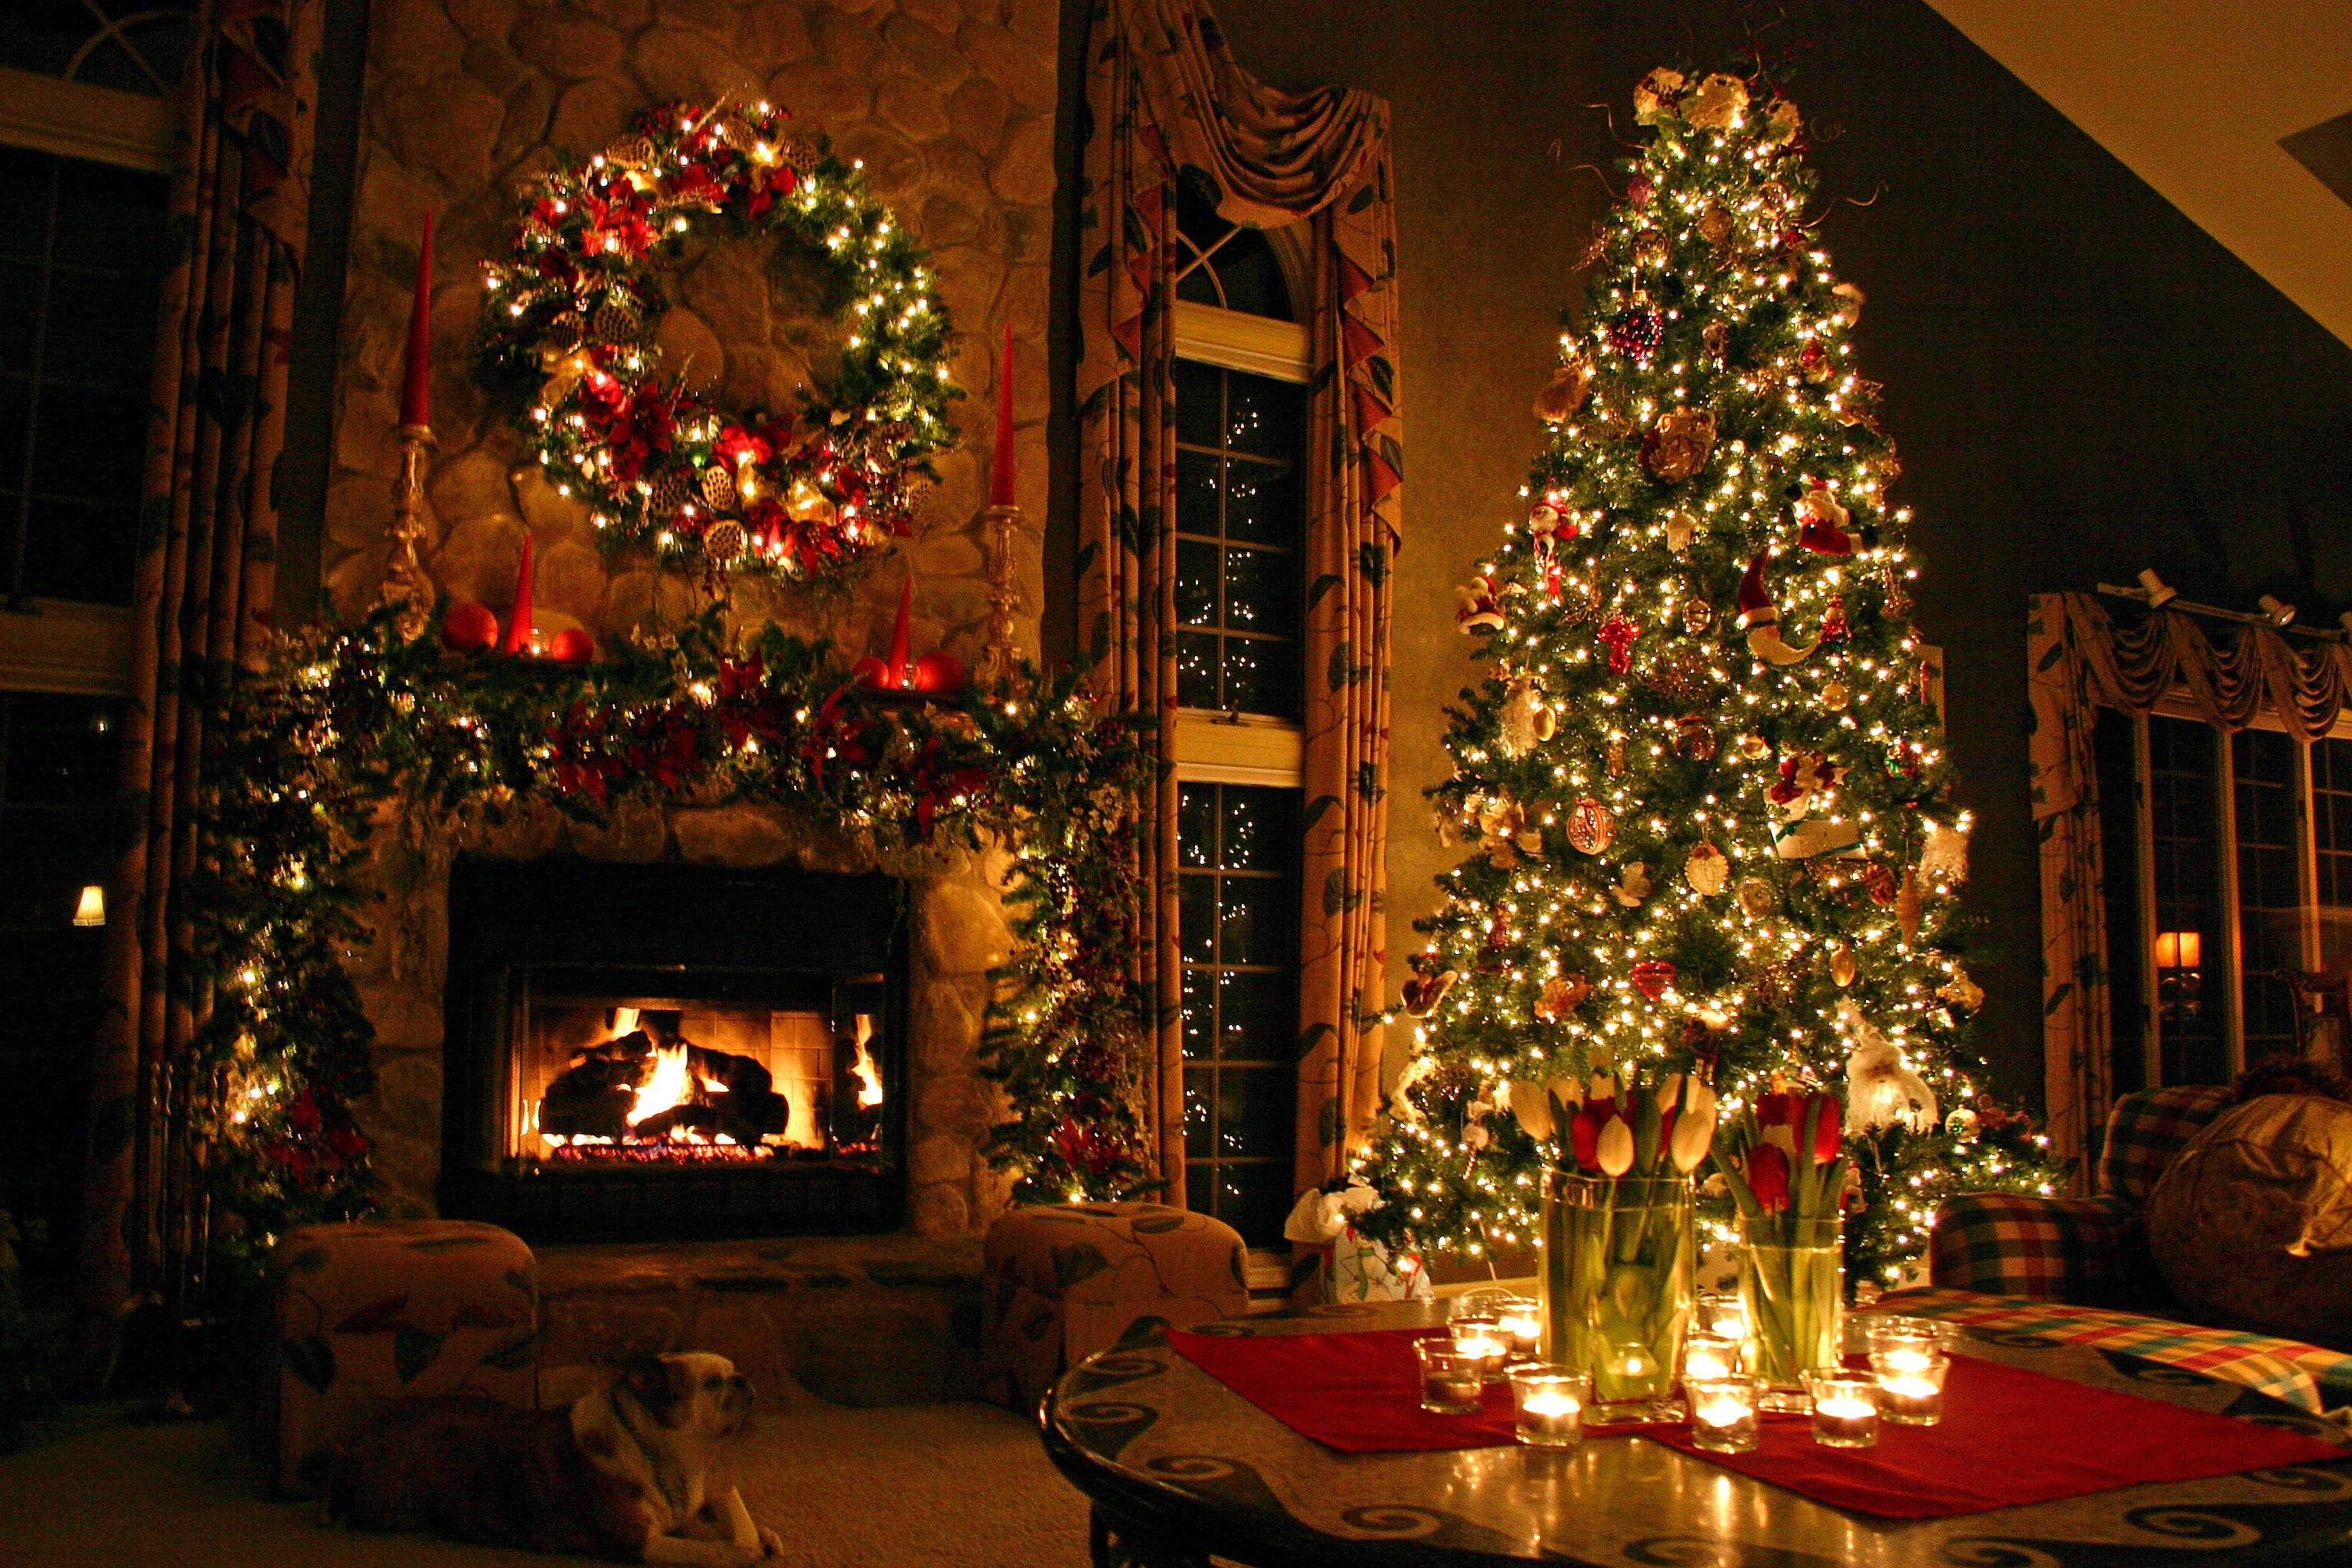 weihnachten wallpapers hintergr nde 3072x2048 id 300958. Black Bedroom Furniture Sets. Home Design Ideas